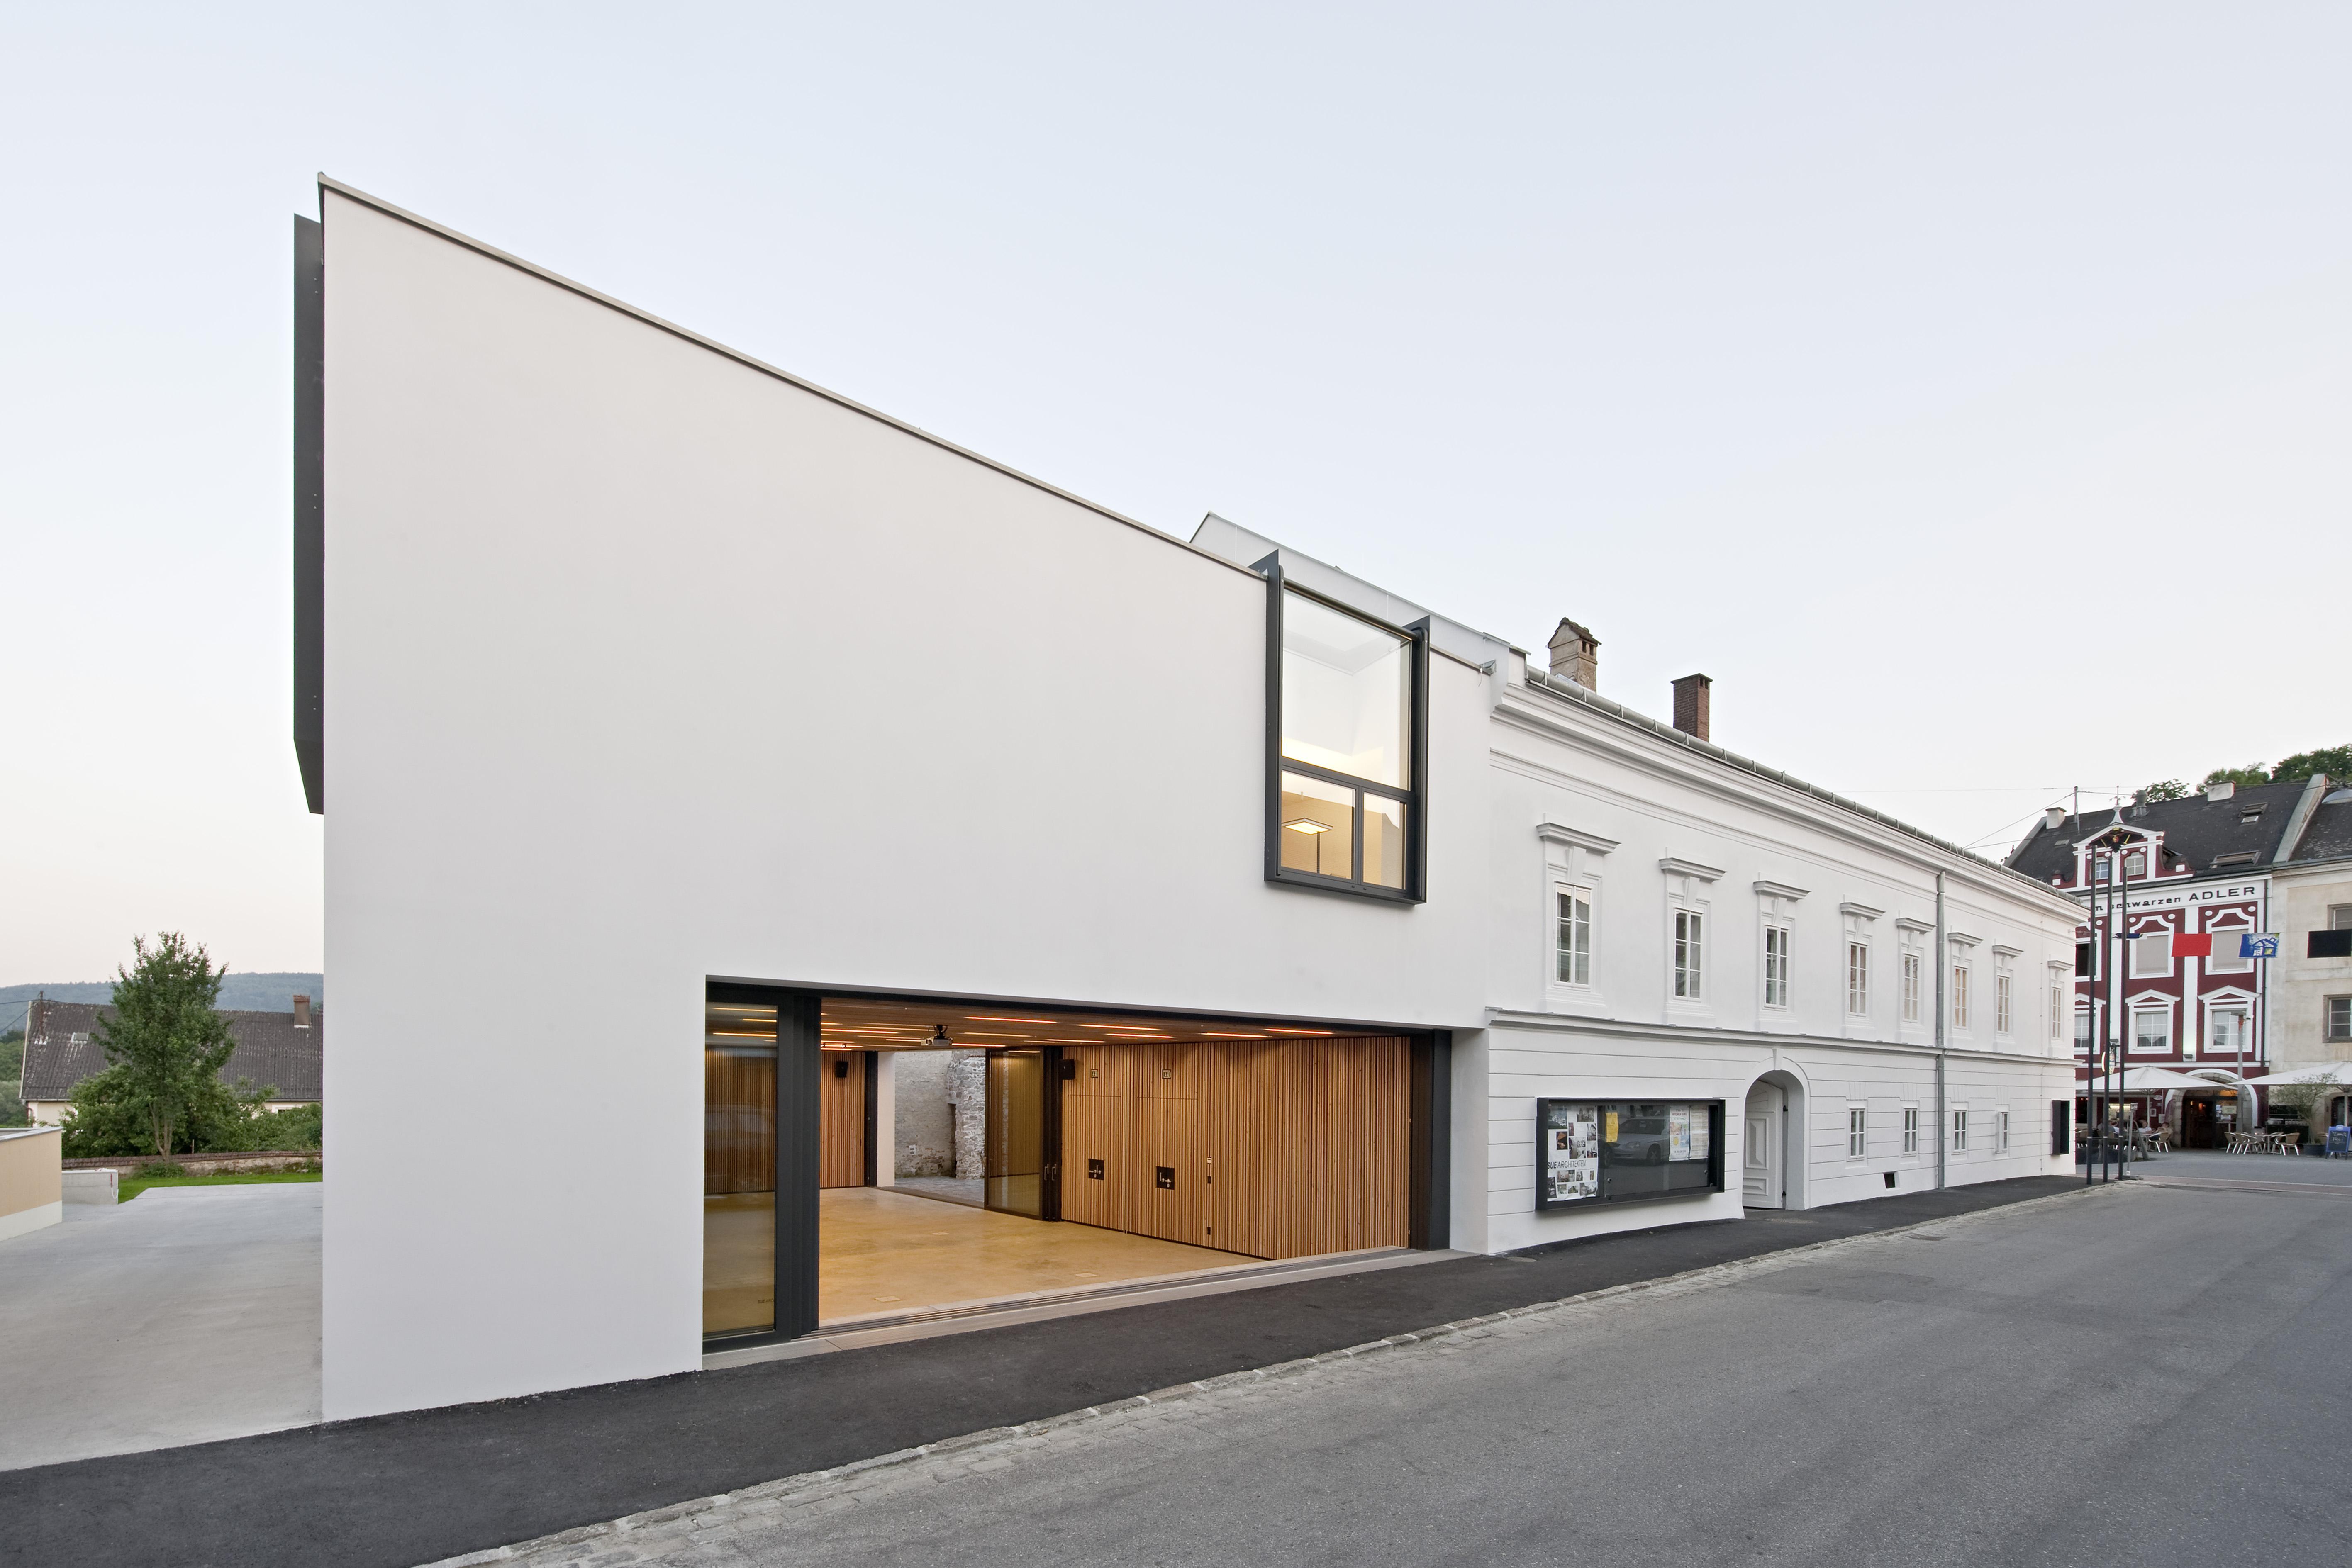 sue architekten the open municipal hall hic arquitectura. Black Bedroom Furniture Sets. Home Design Ideas